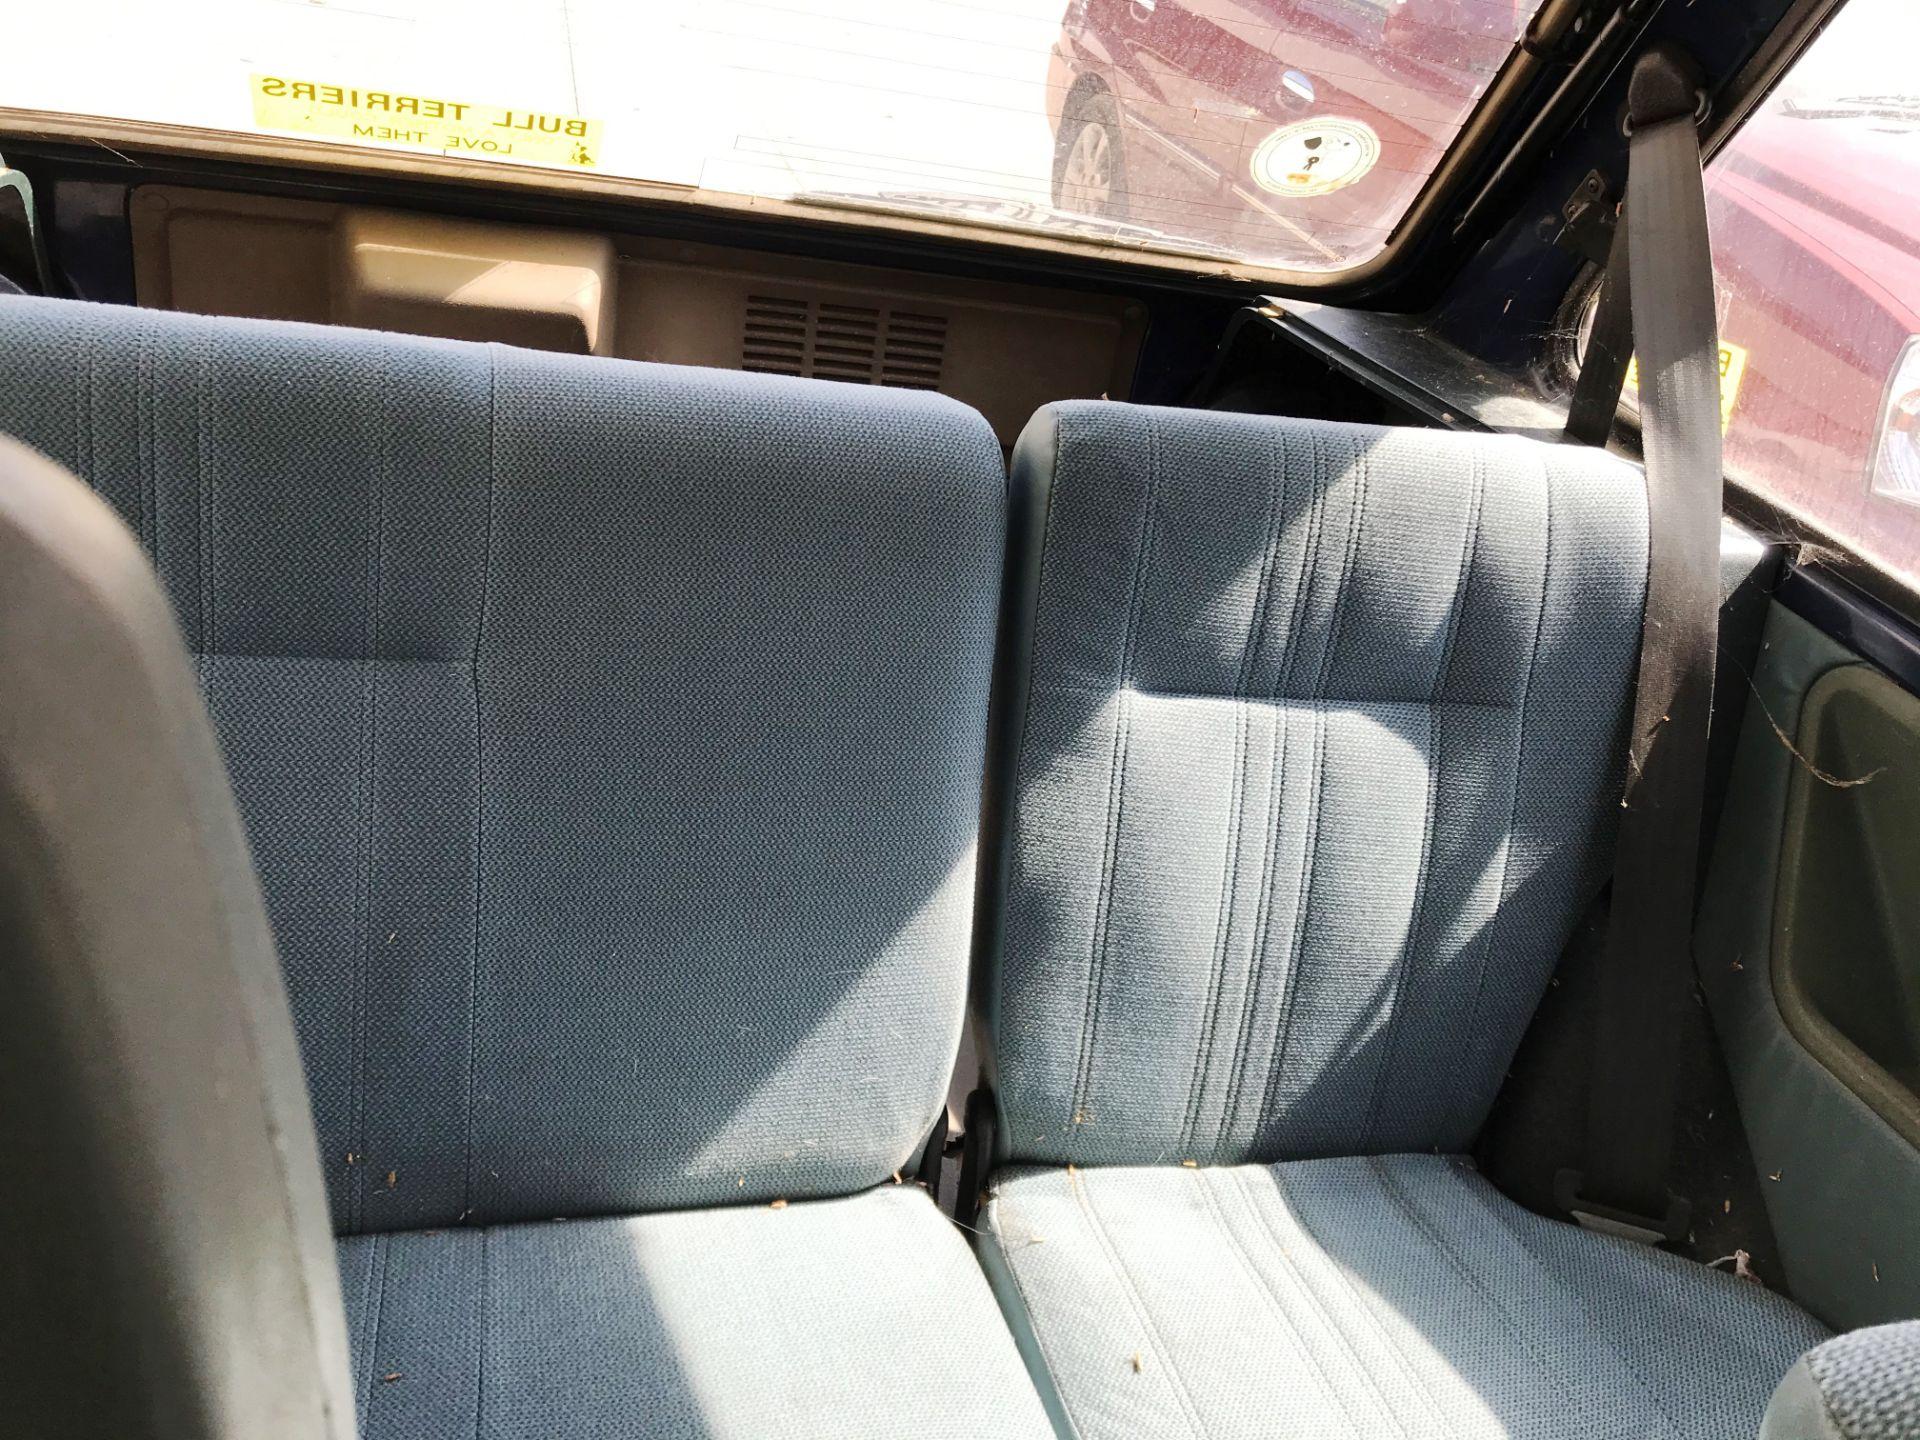 GARAGE FIND - IN NEED OF FULL RESTORATION AUSTIN METRO 1300L 3 DOOR HATCHBACK - petrol - blue - Image 8 of 11